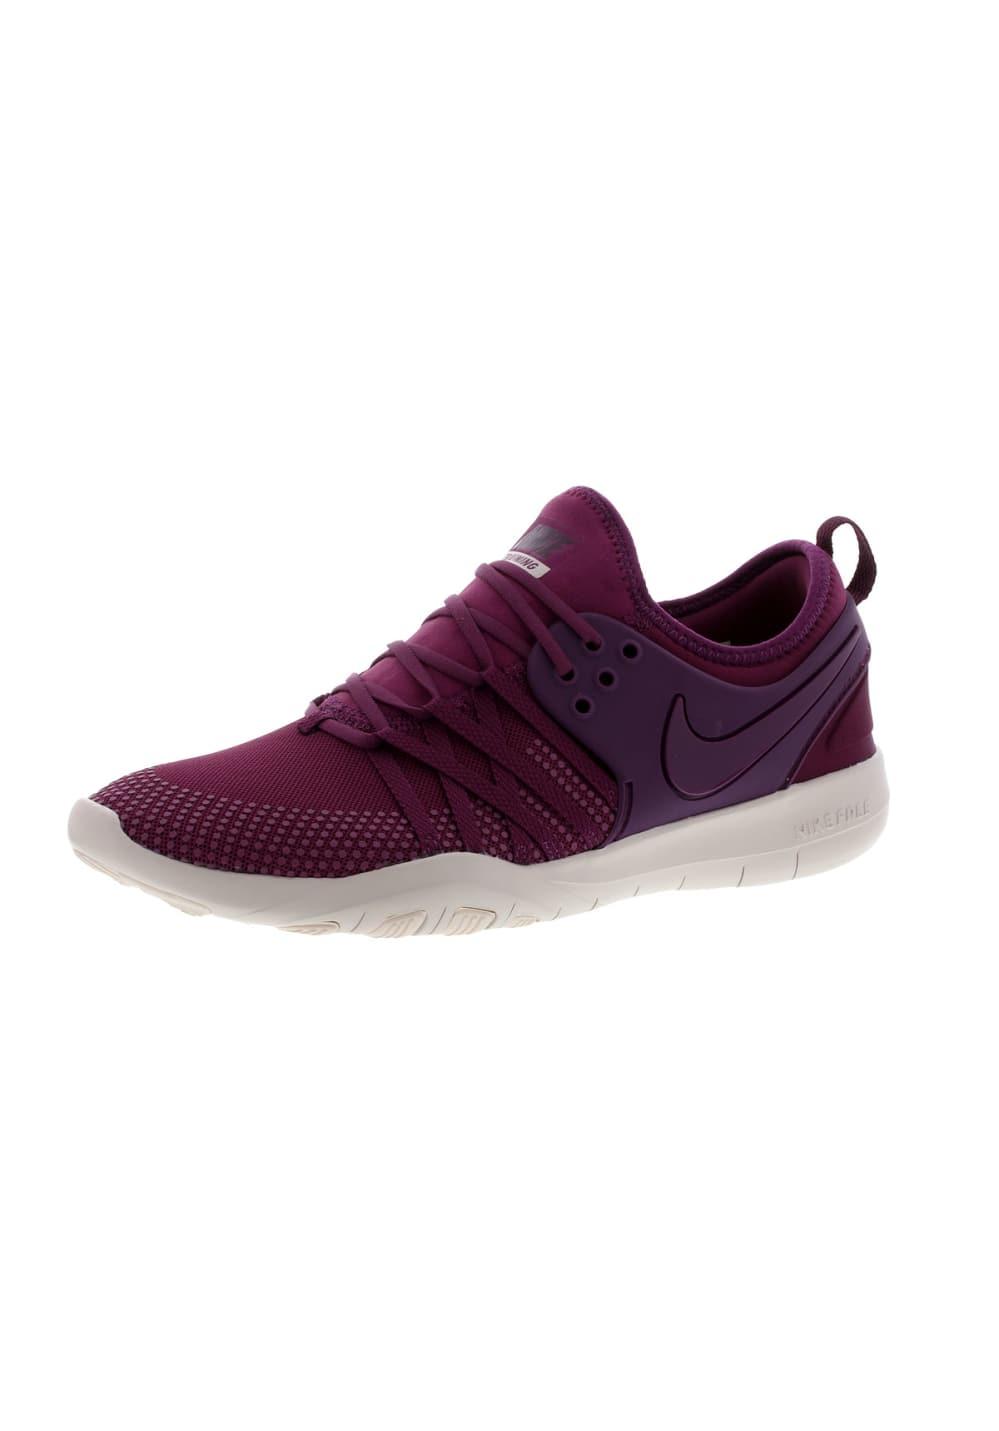 nike free tr 7 purple